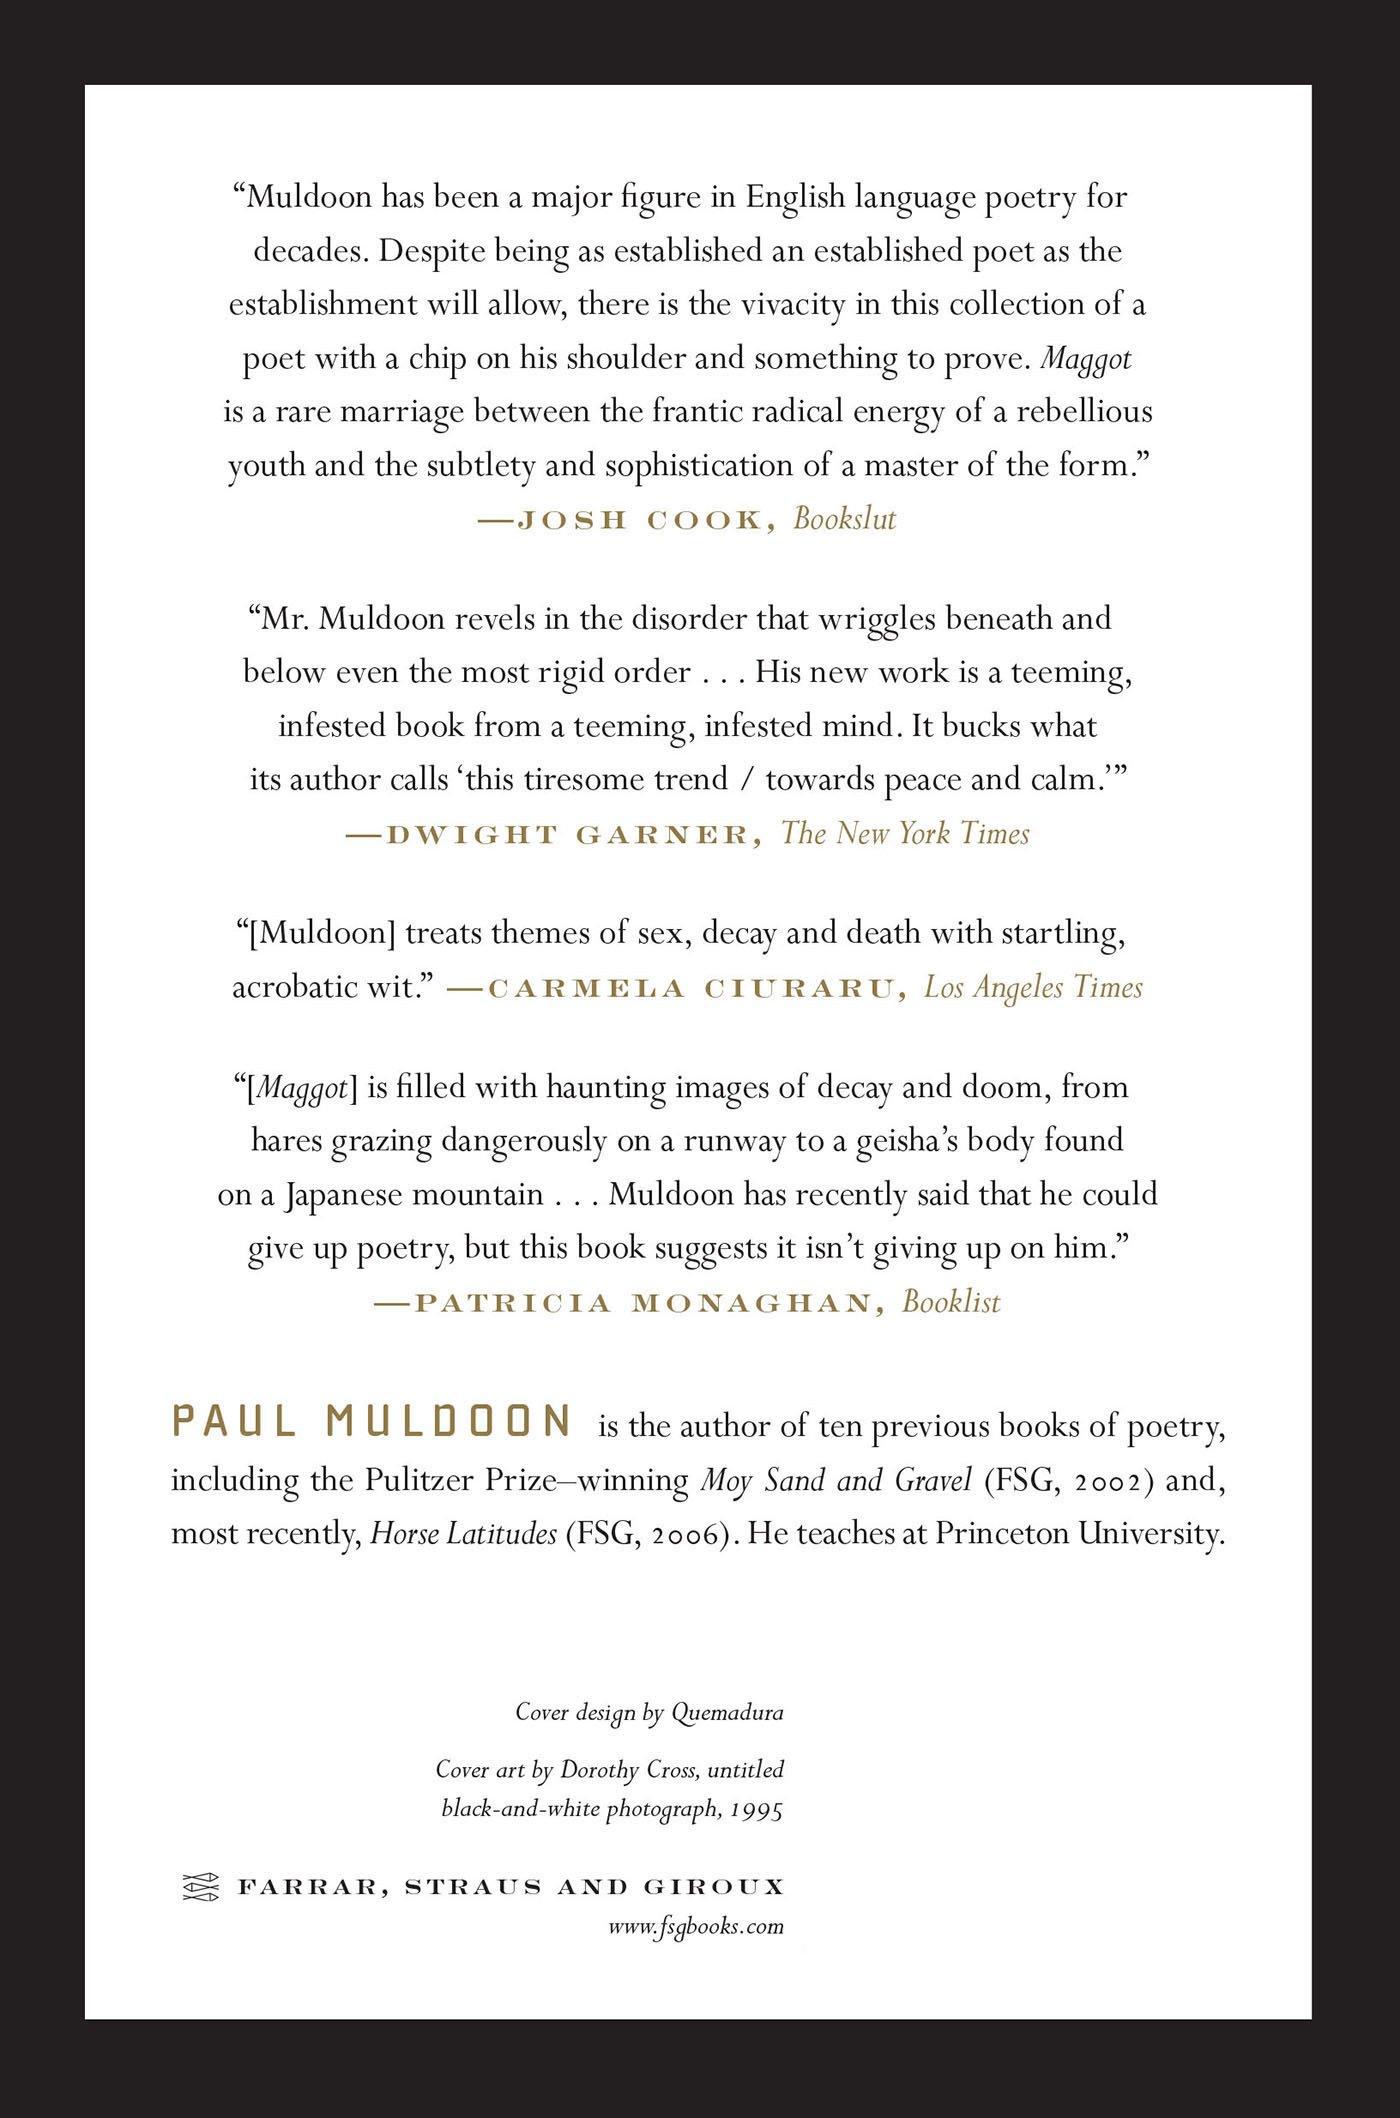 Maggot Poems Paul Muldoon 9780374533014 Amazoncom Books